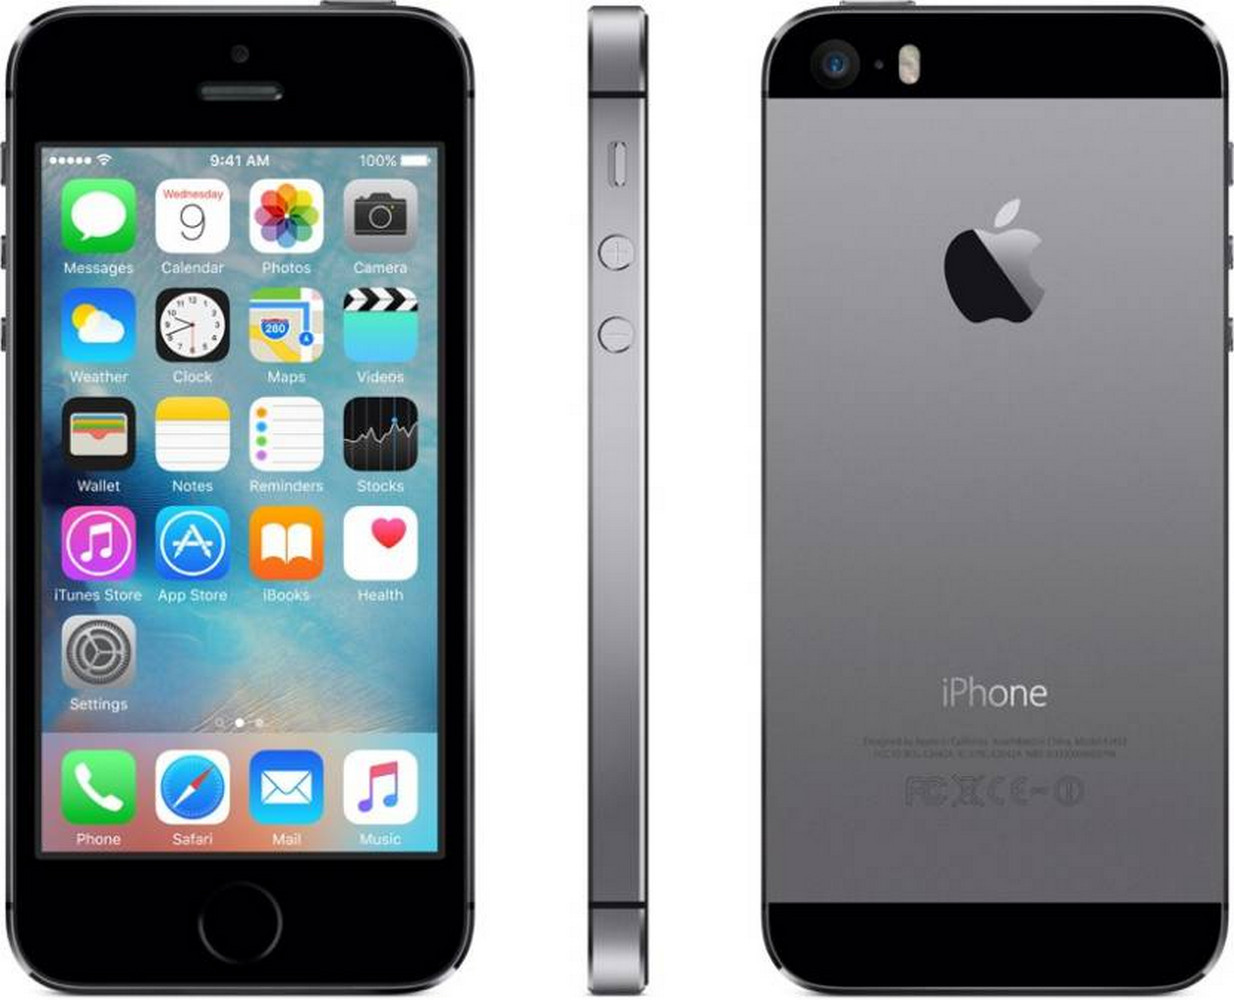 Apple-iPhone-5s-Unlocked-GSM-Unlocked-AT-amp-T-Verizon-T-Mobile-A1533 thumbnail 13